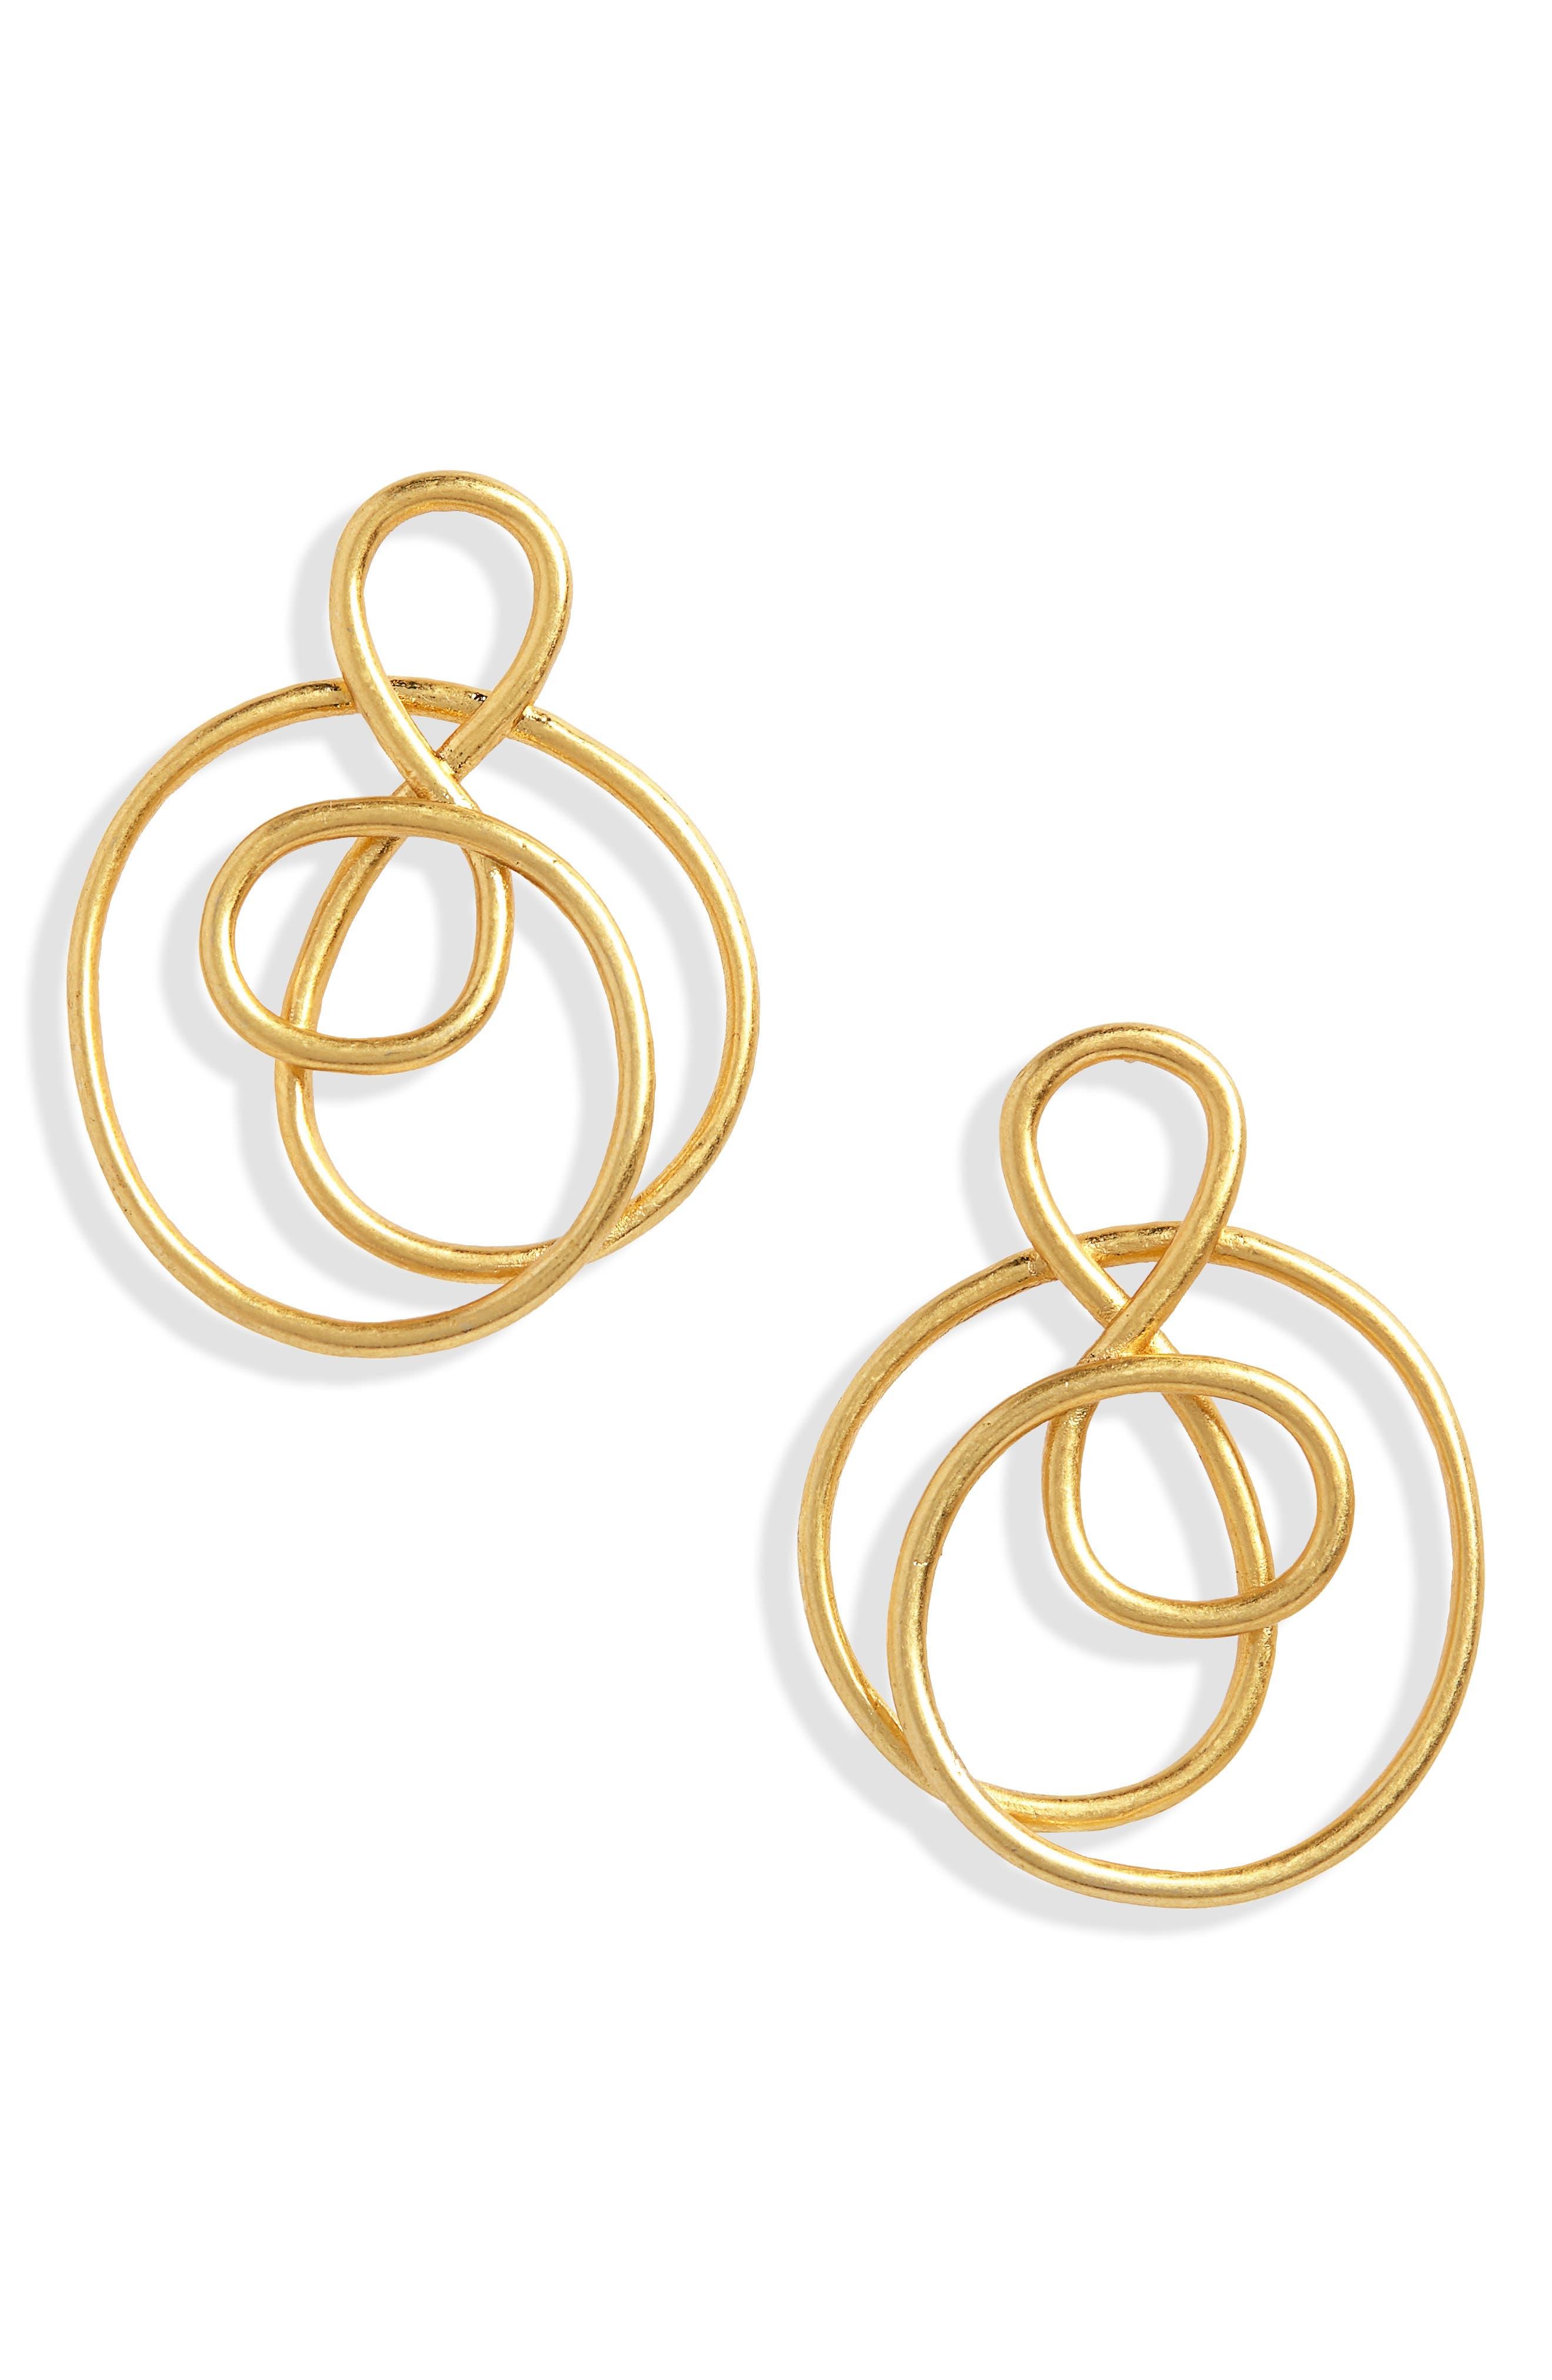 Treble Twist Earrings,                         Main,                         color, VINTAGE GOLD